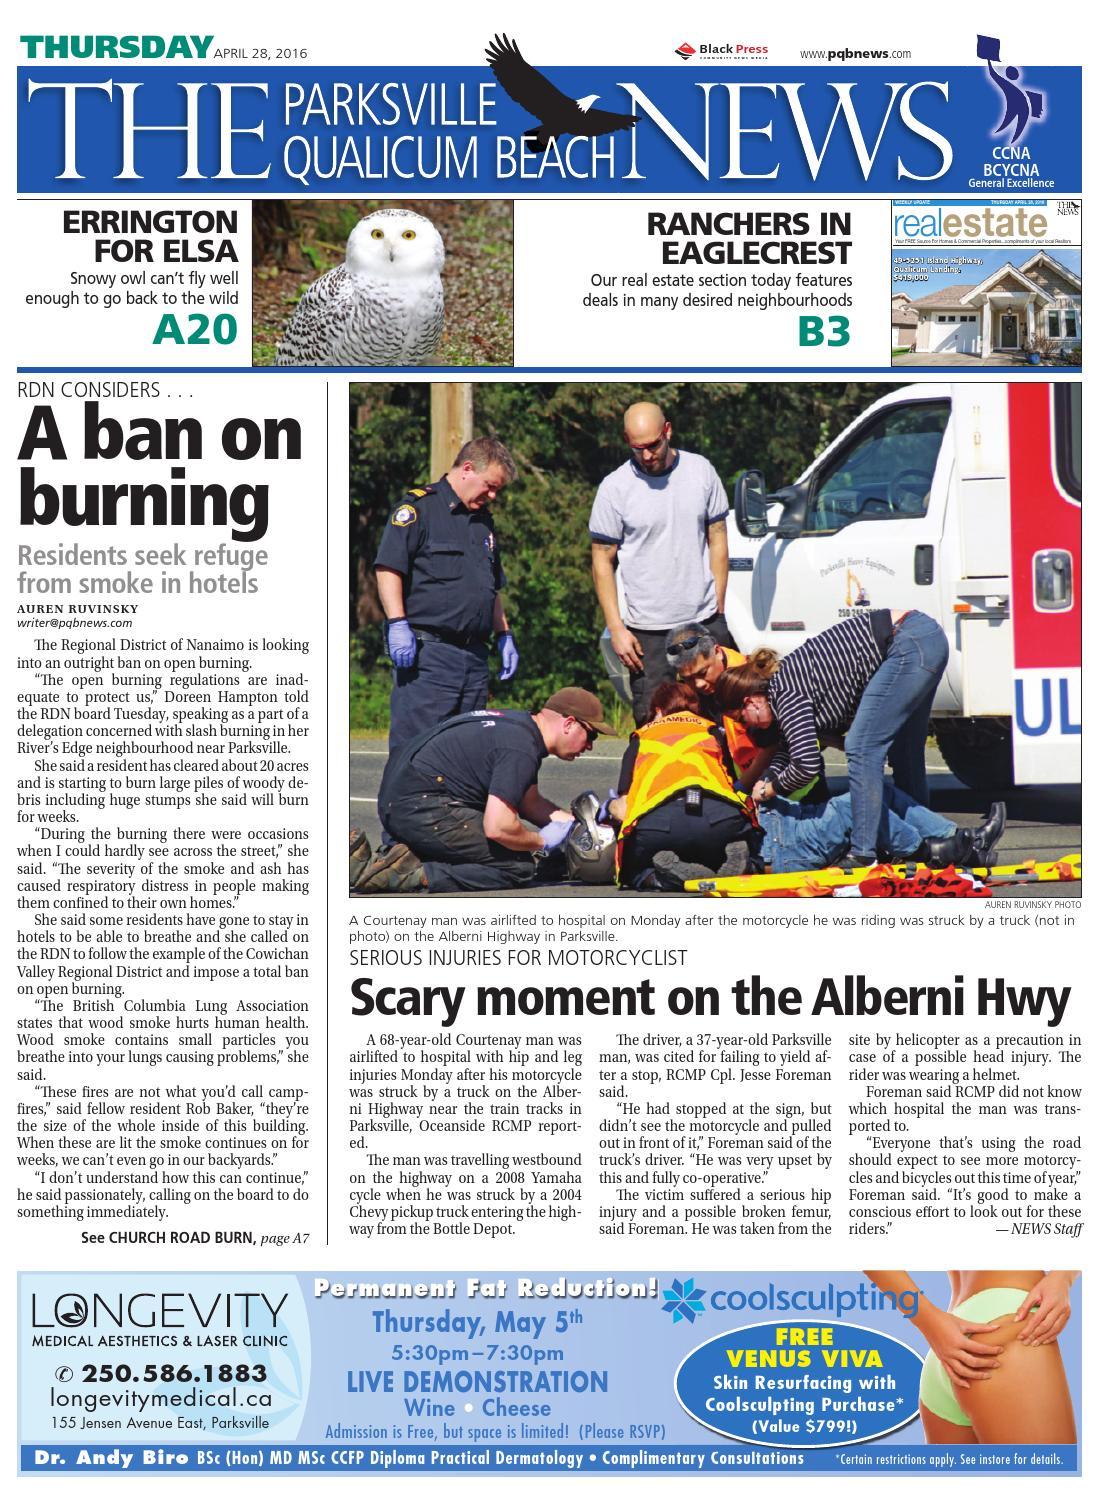 Parksville Qualicum Beach News, April 28, 2016 by Black Press Media